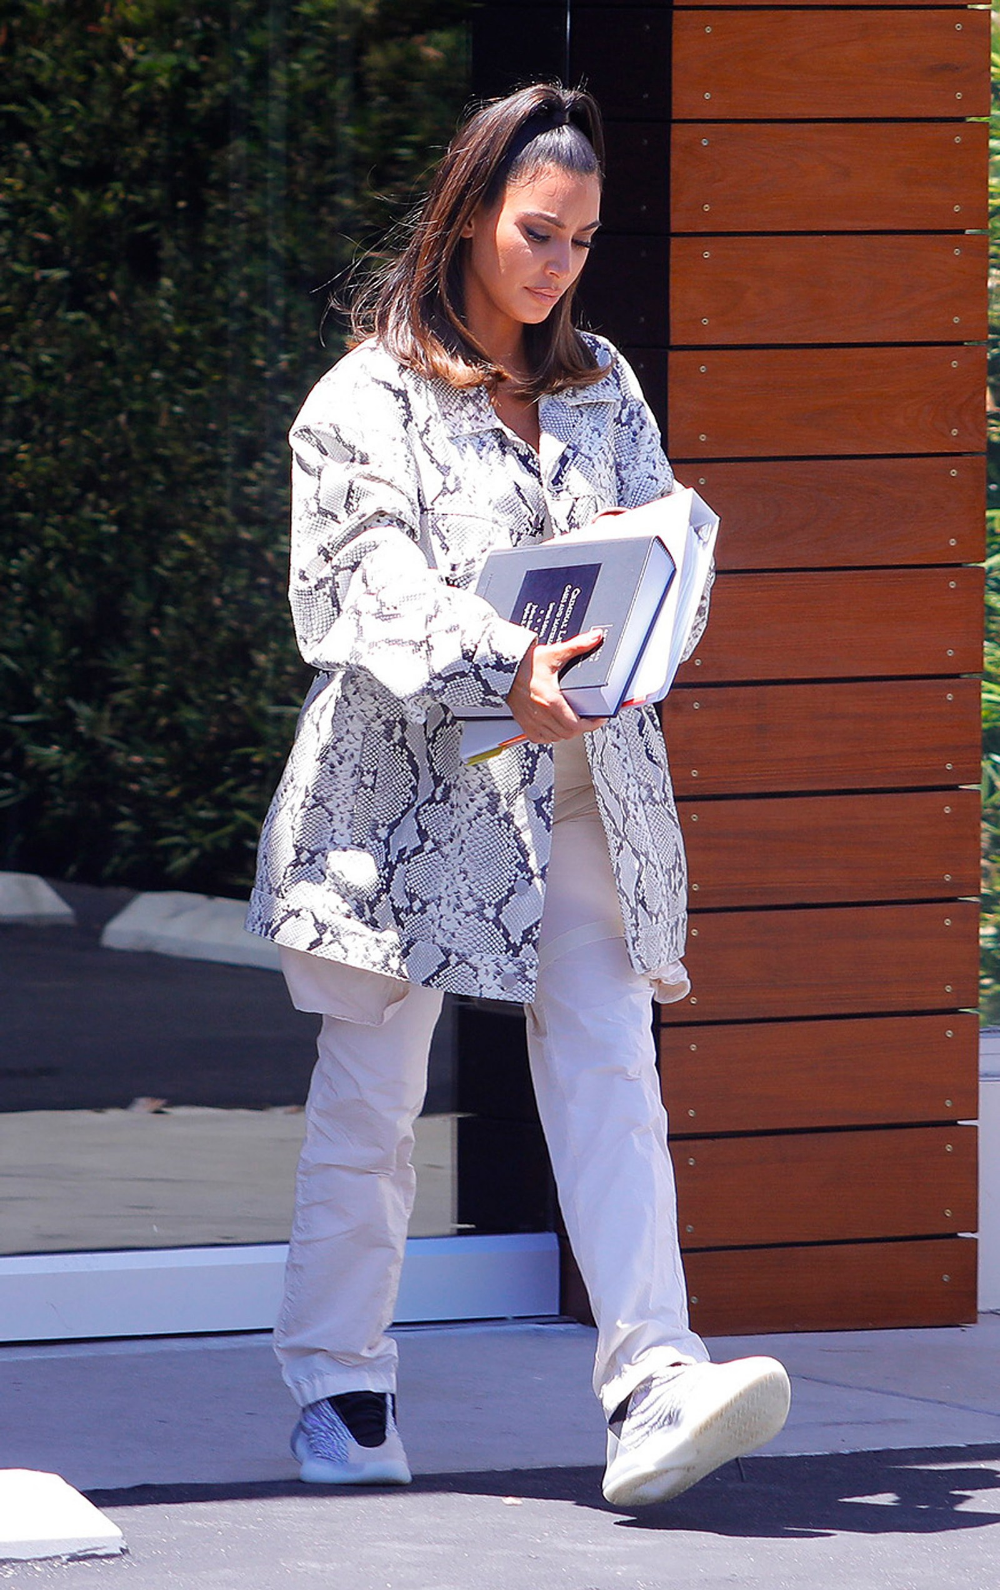 Kim Kardashian Law School Become A Lawyer In 2020 Halle Berry